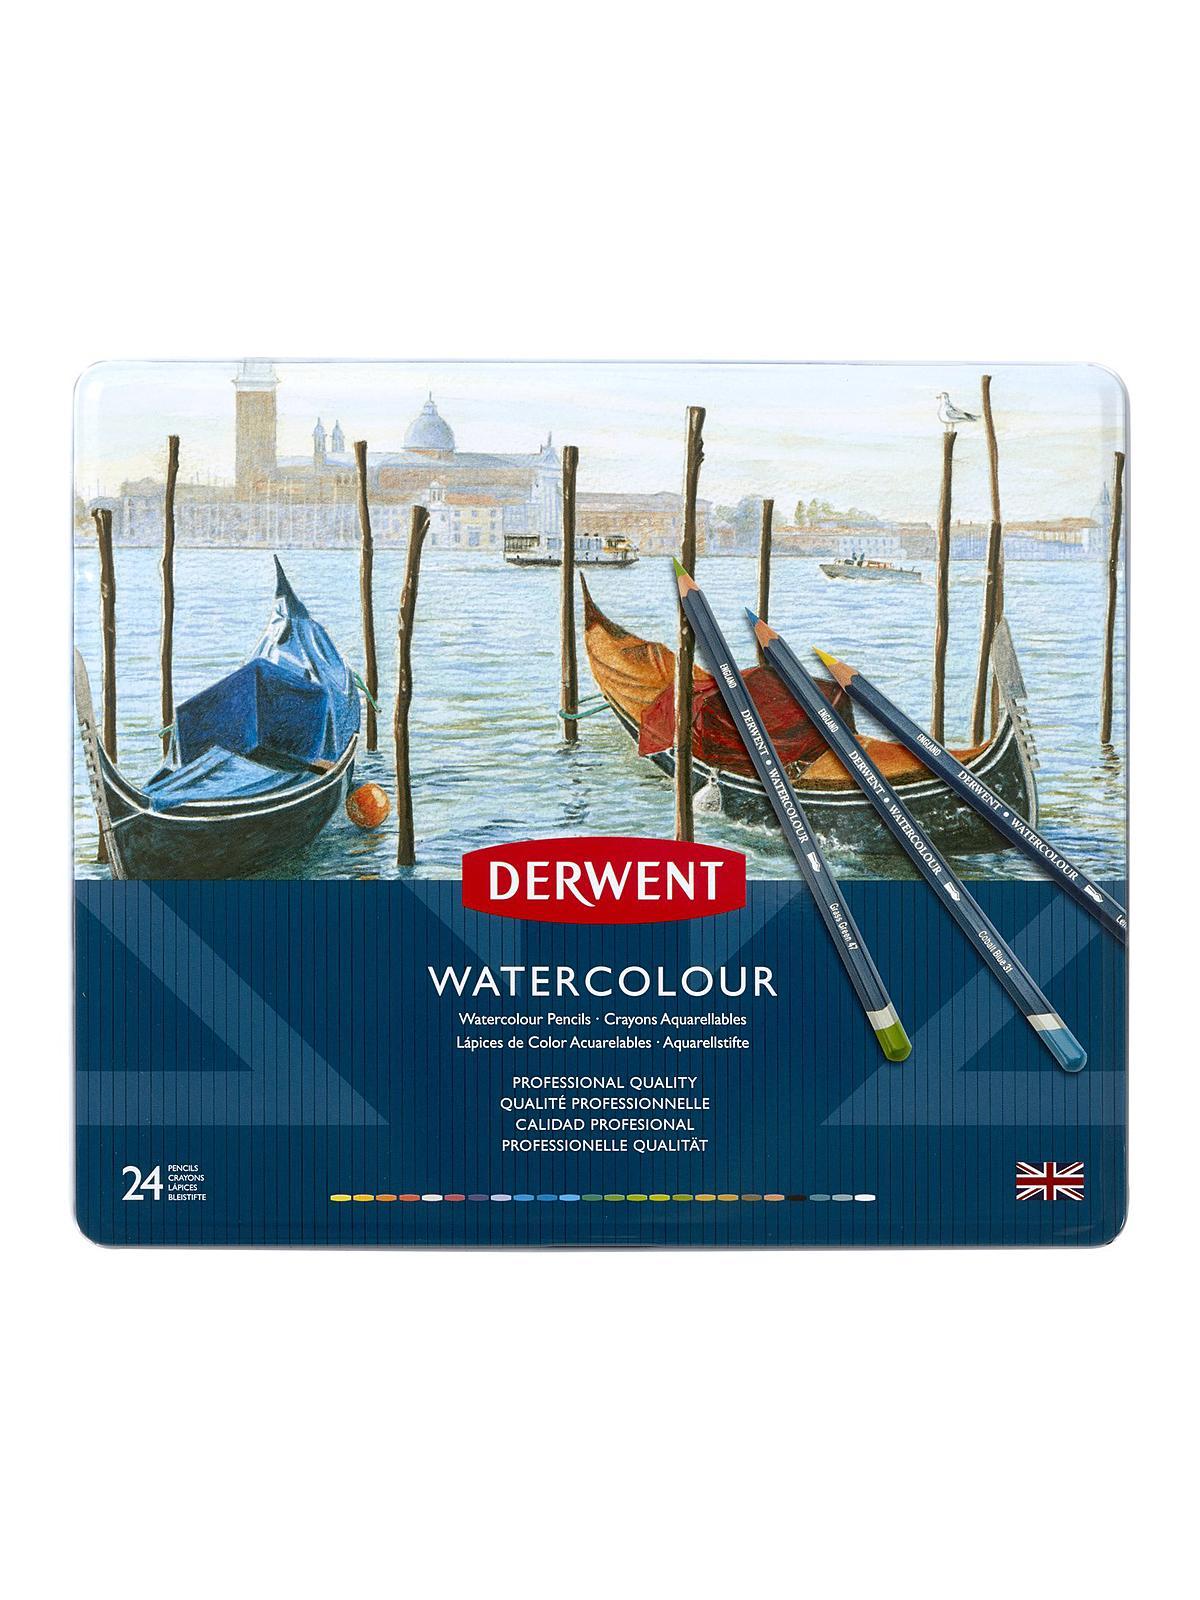 Derwent Watercolor Pencil Sets in Tins | MisterArt.com